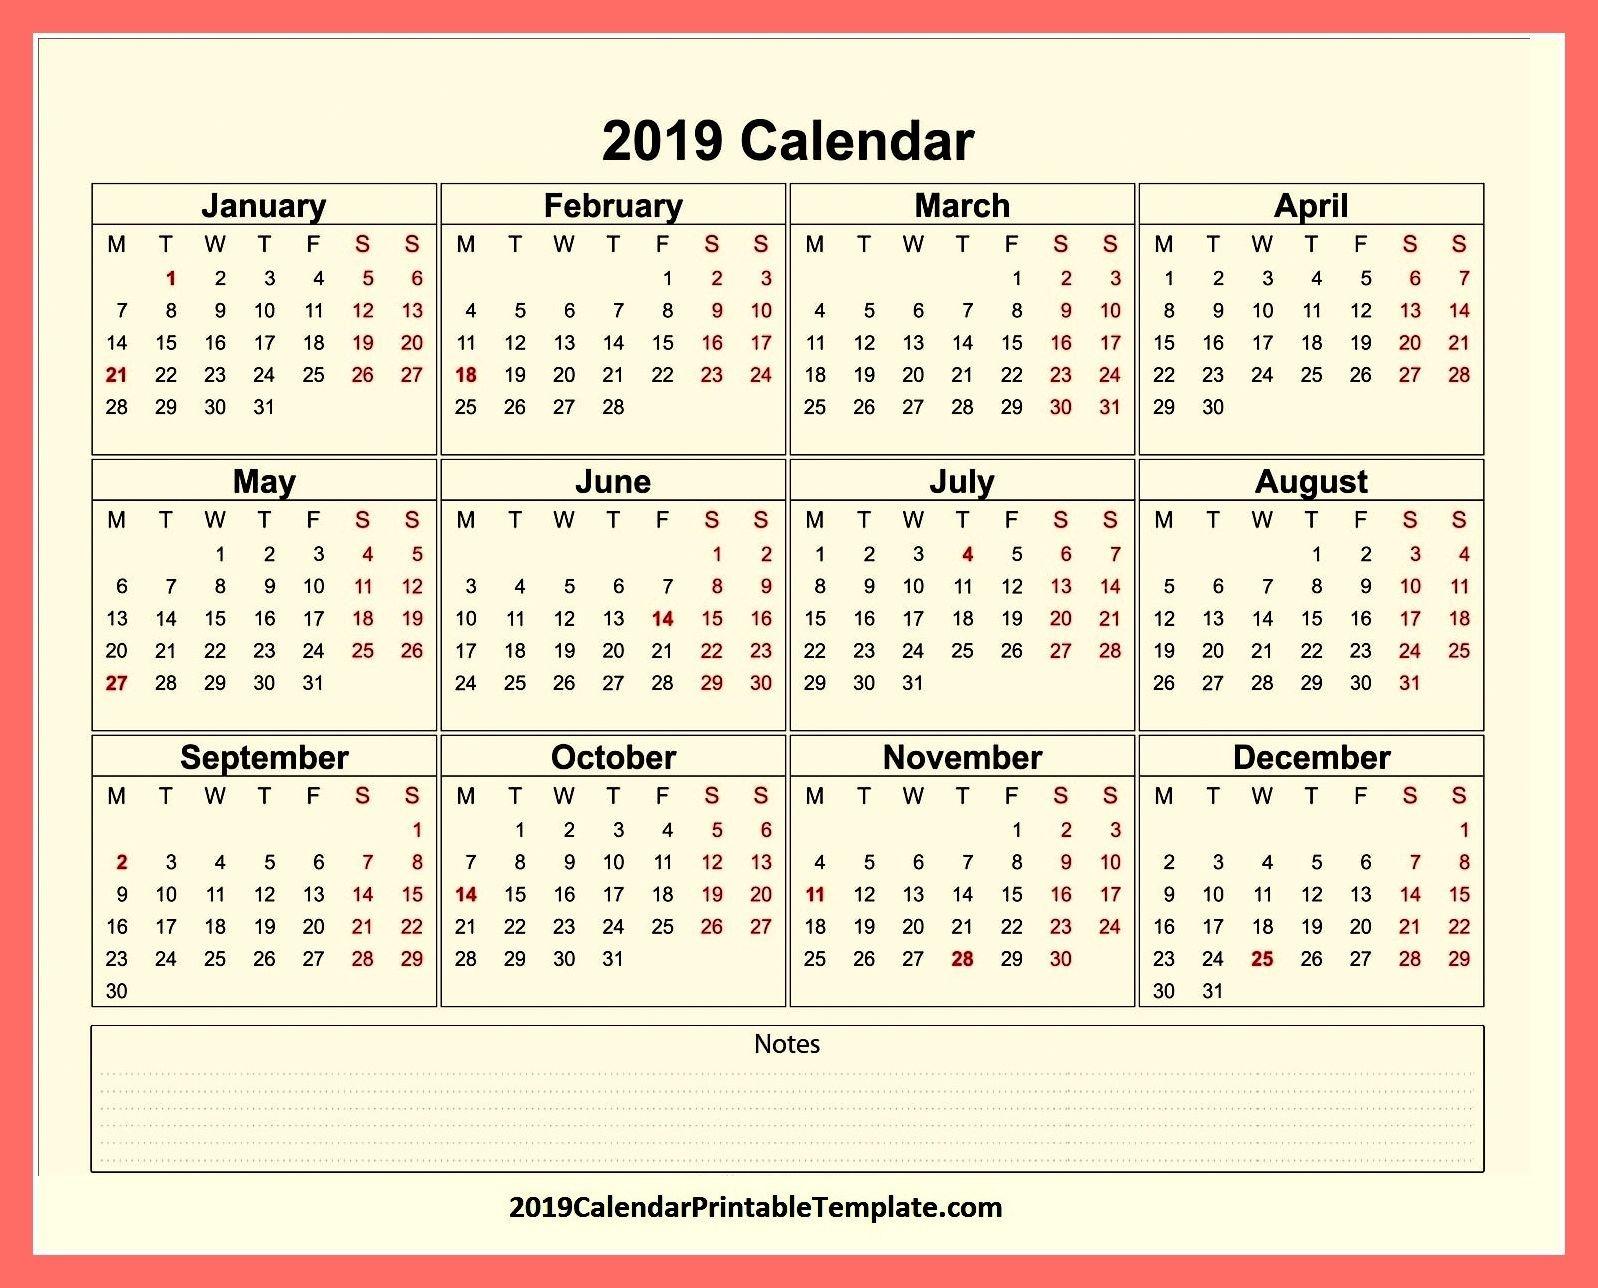 Pin2019Calendarprintabletemplate On 2019 Calendar Holidays In Calendar 2019 Roman